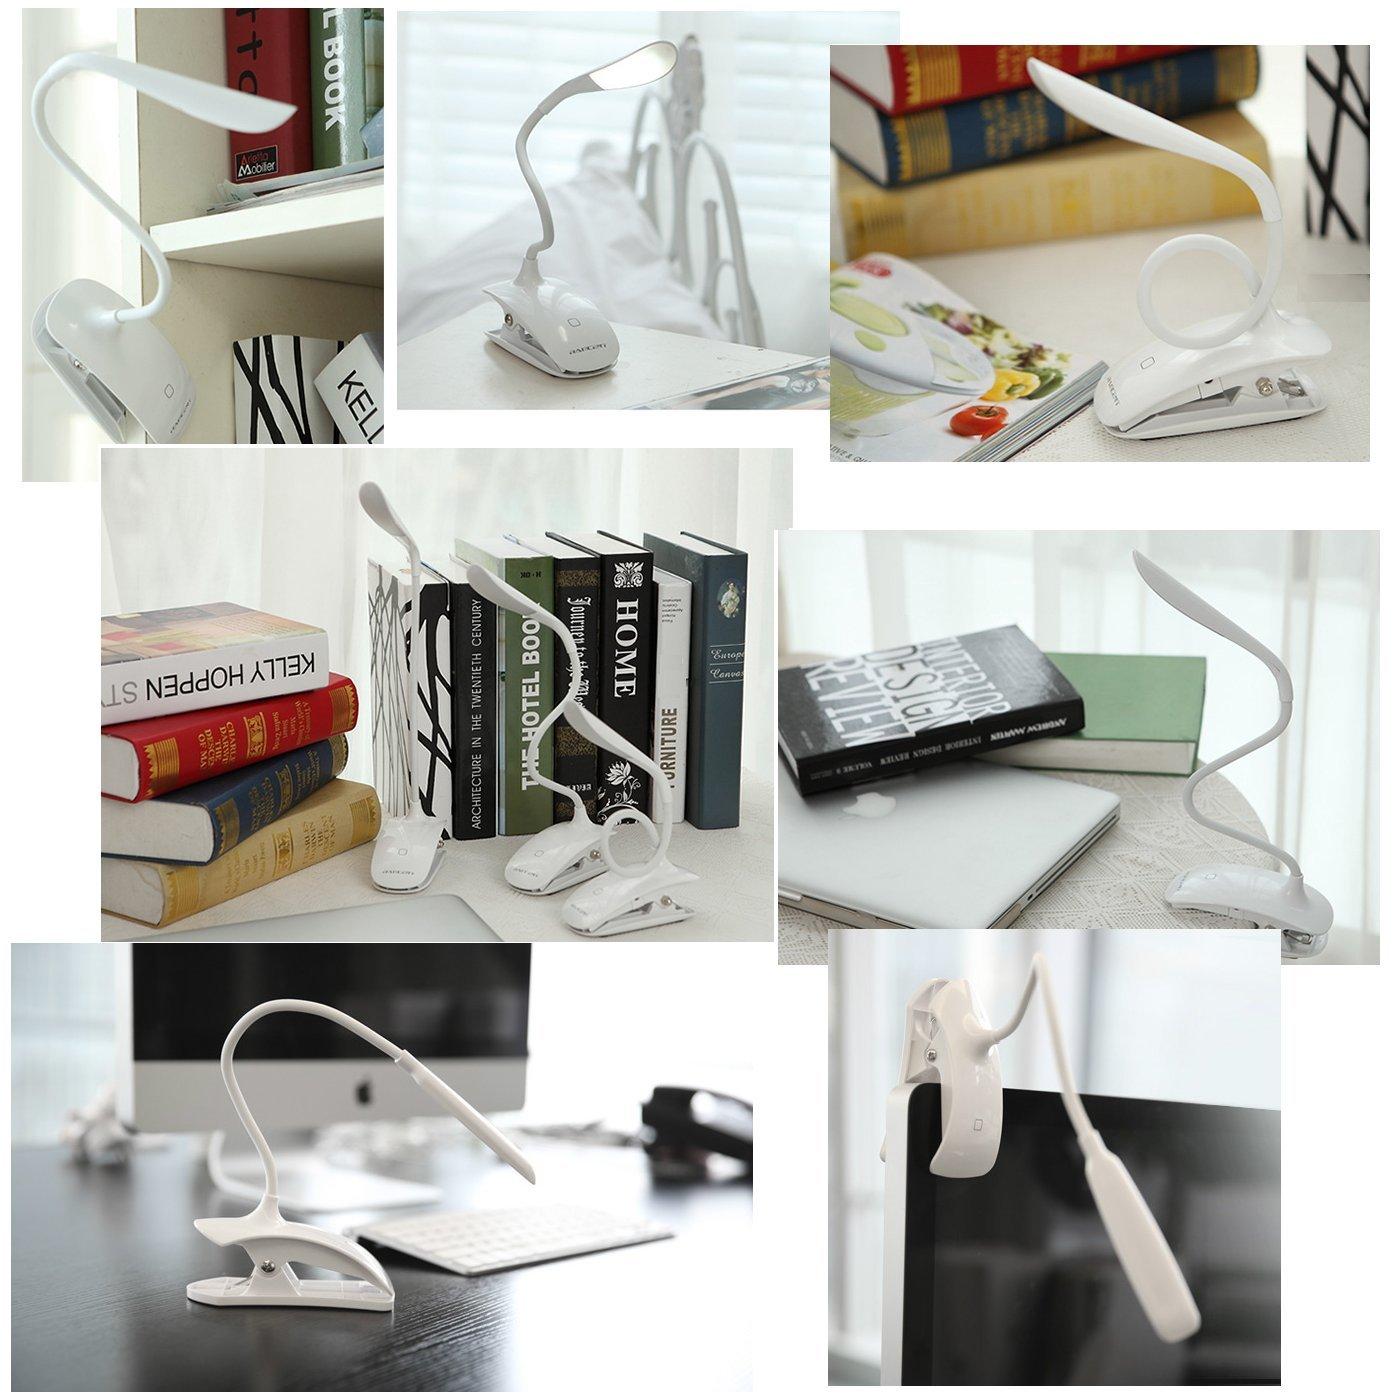 Clip Desk Lamp Table Led Bulb Lamps Set Usb Outlet White